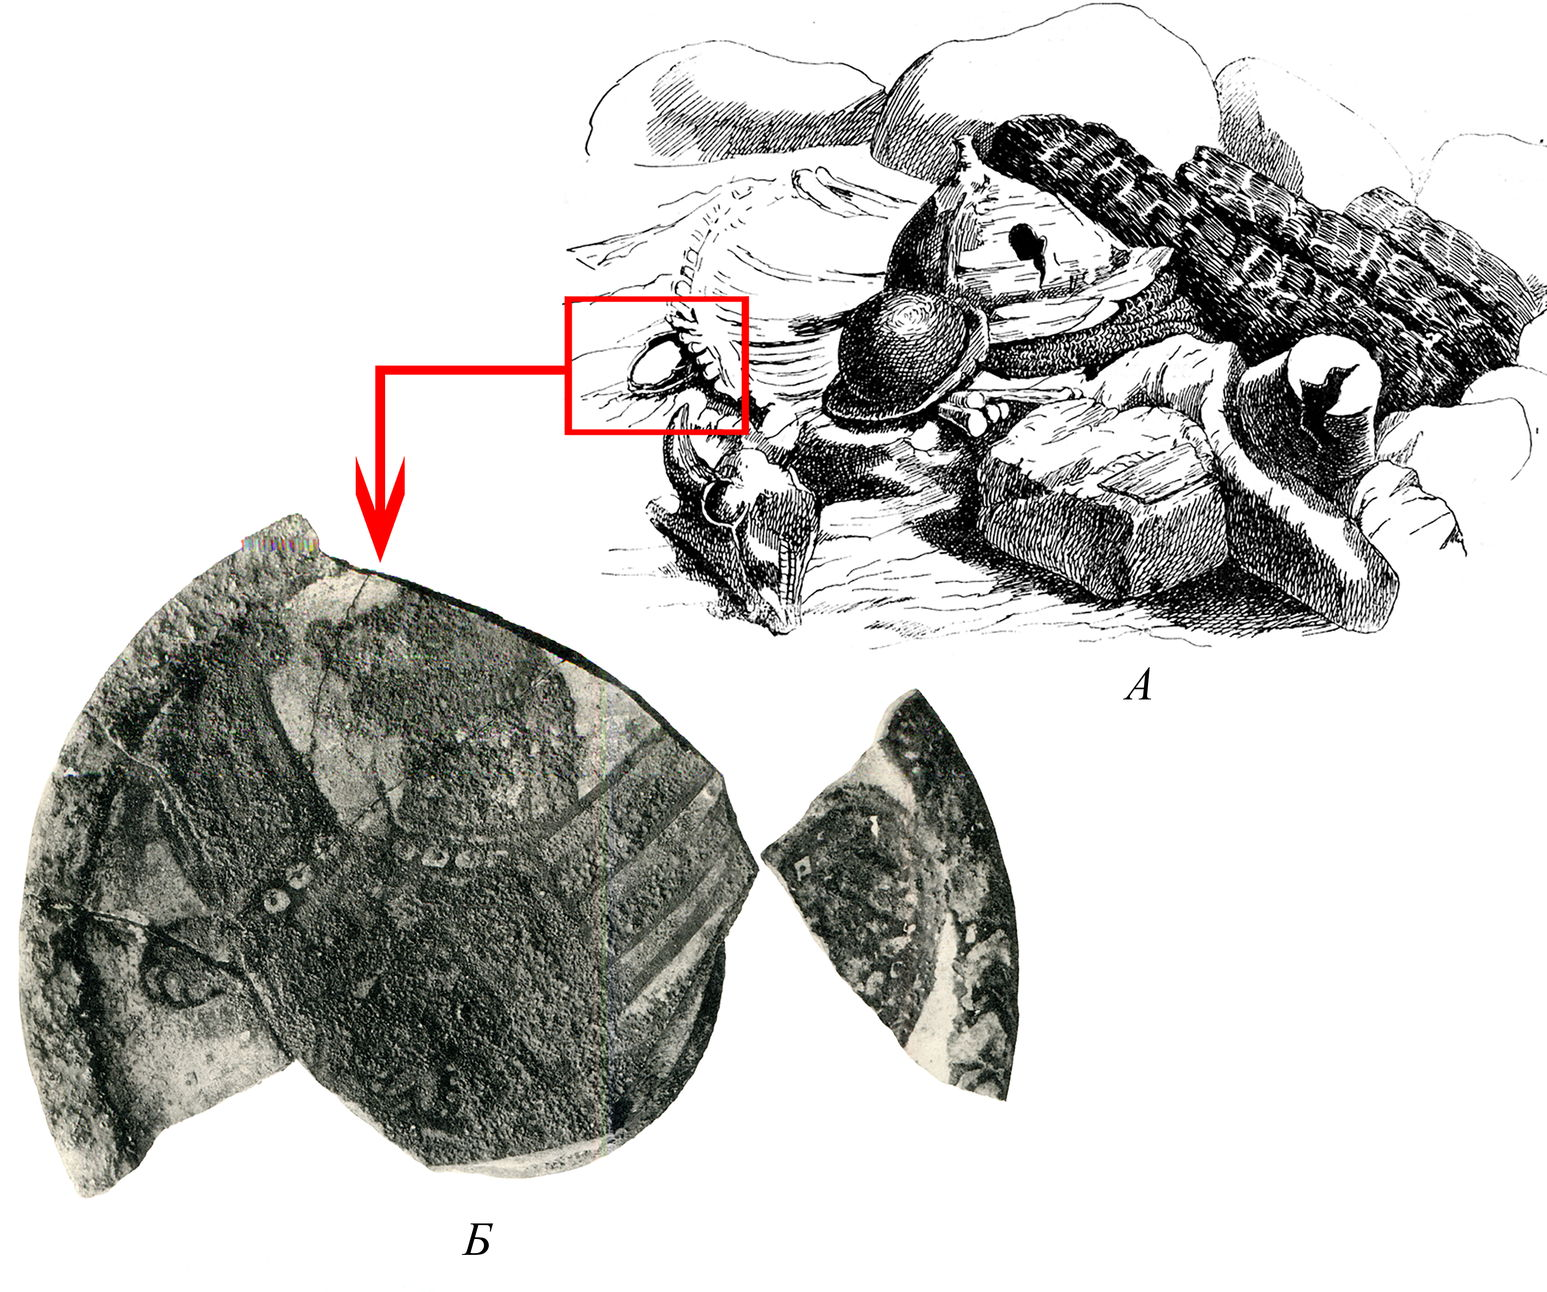 Иллюстрация из книги В.И. Сизова